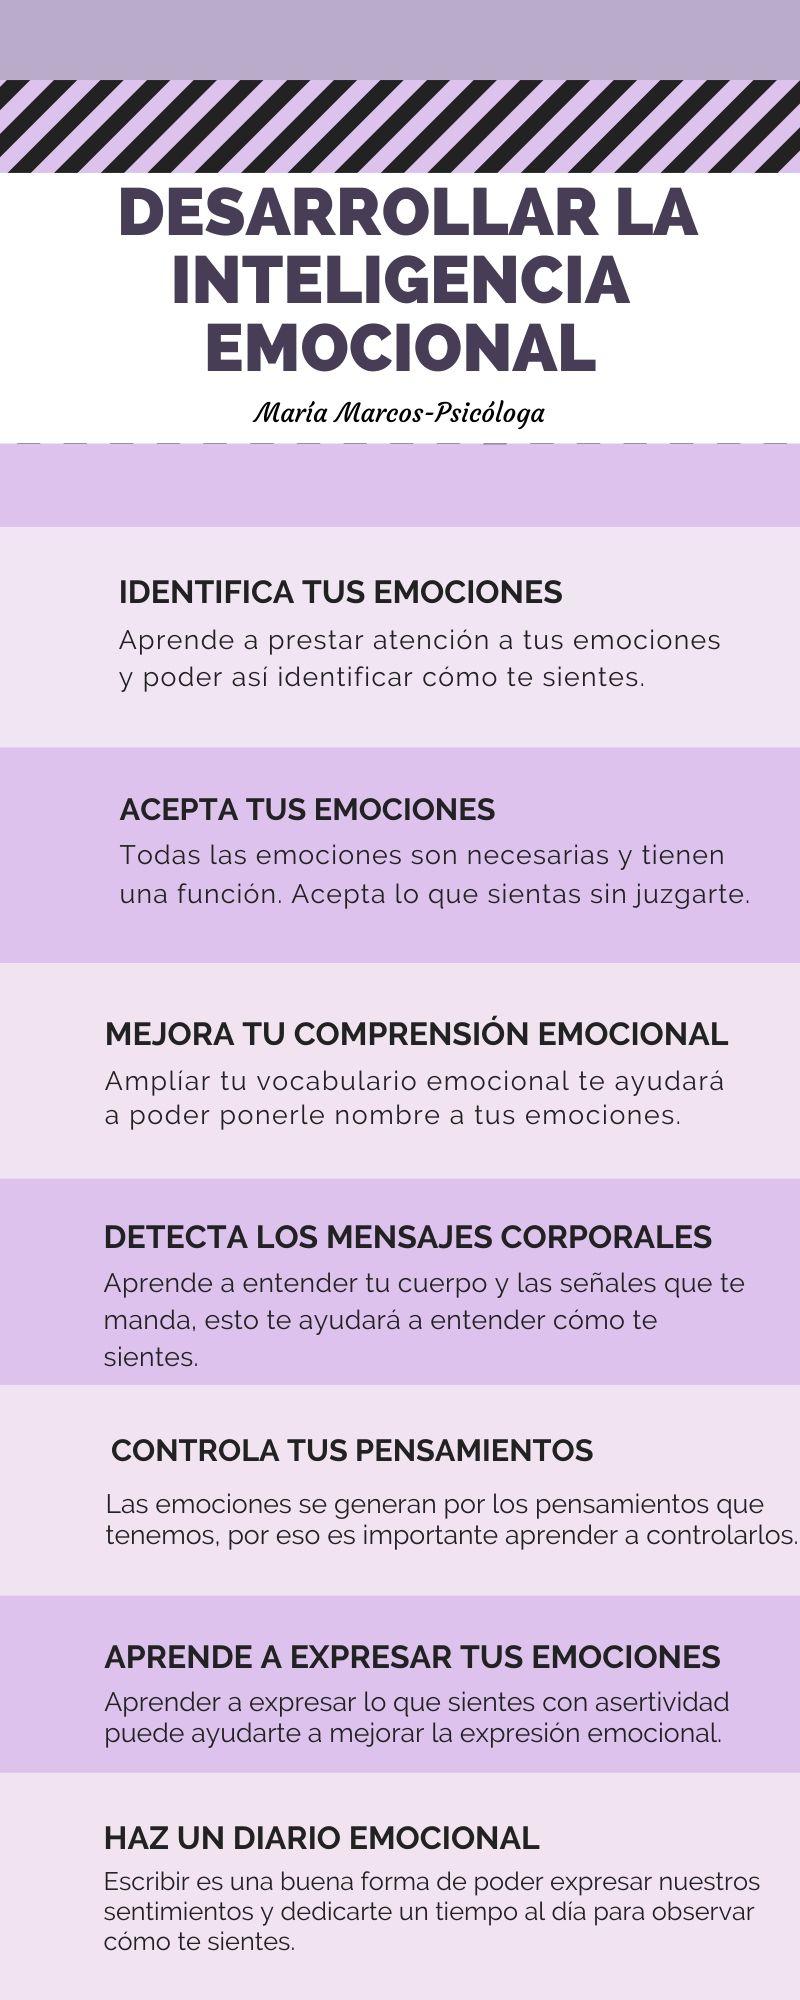 Infografia sobre la inteligencia emocional